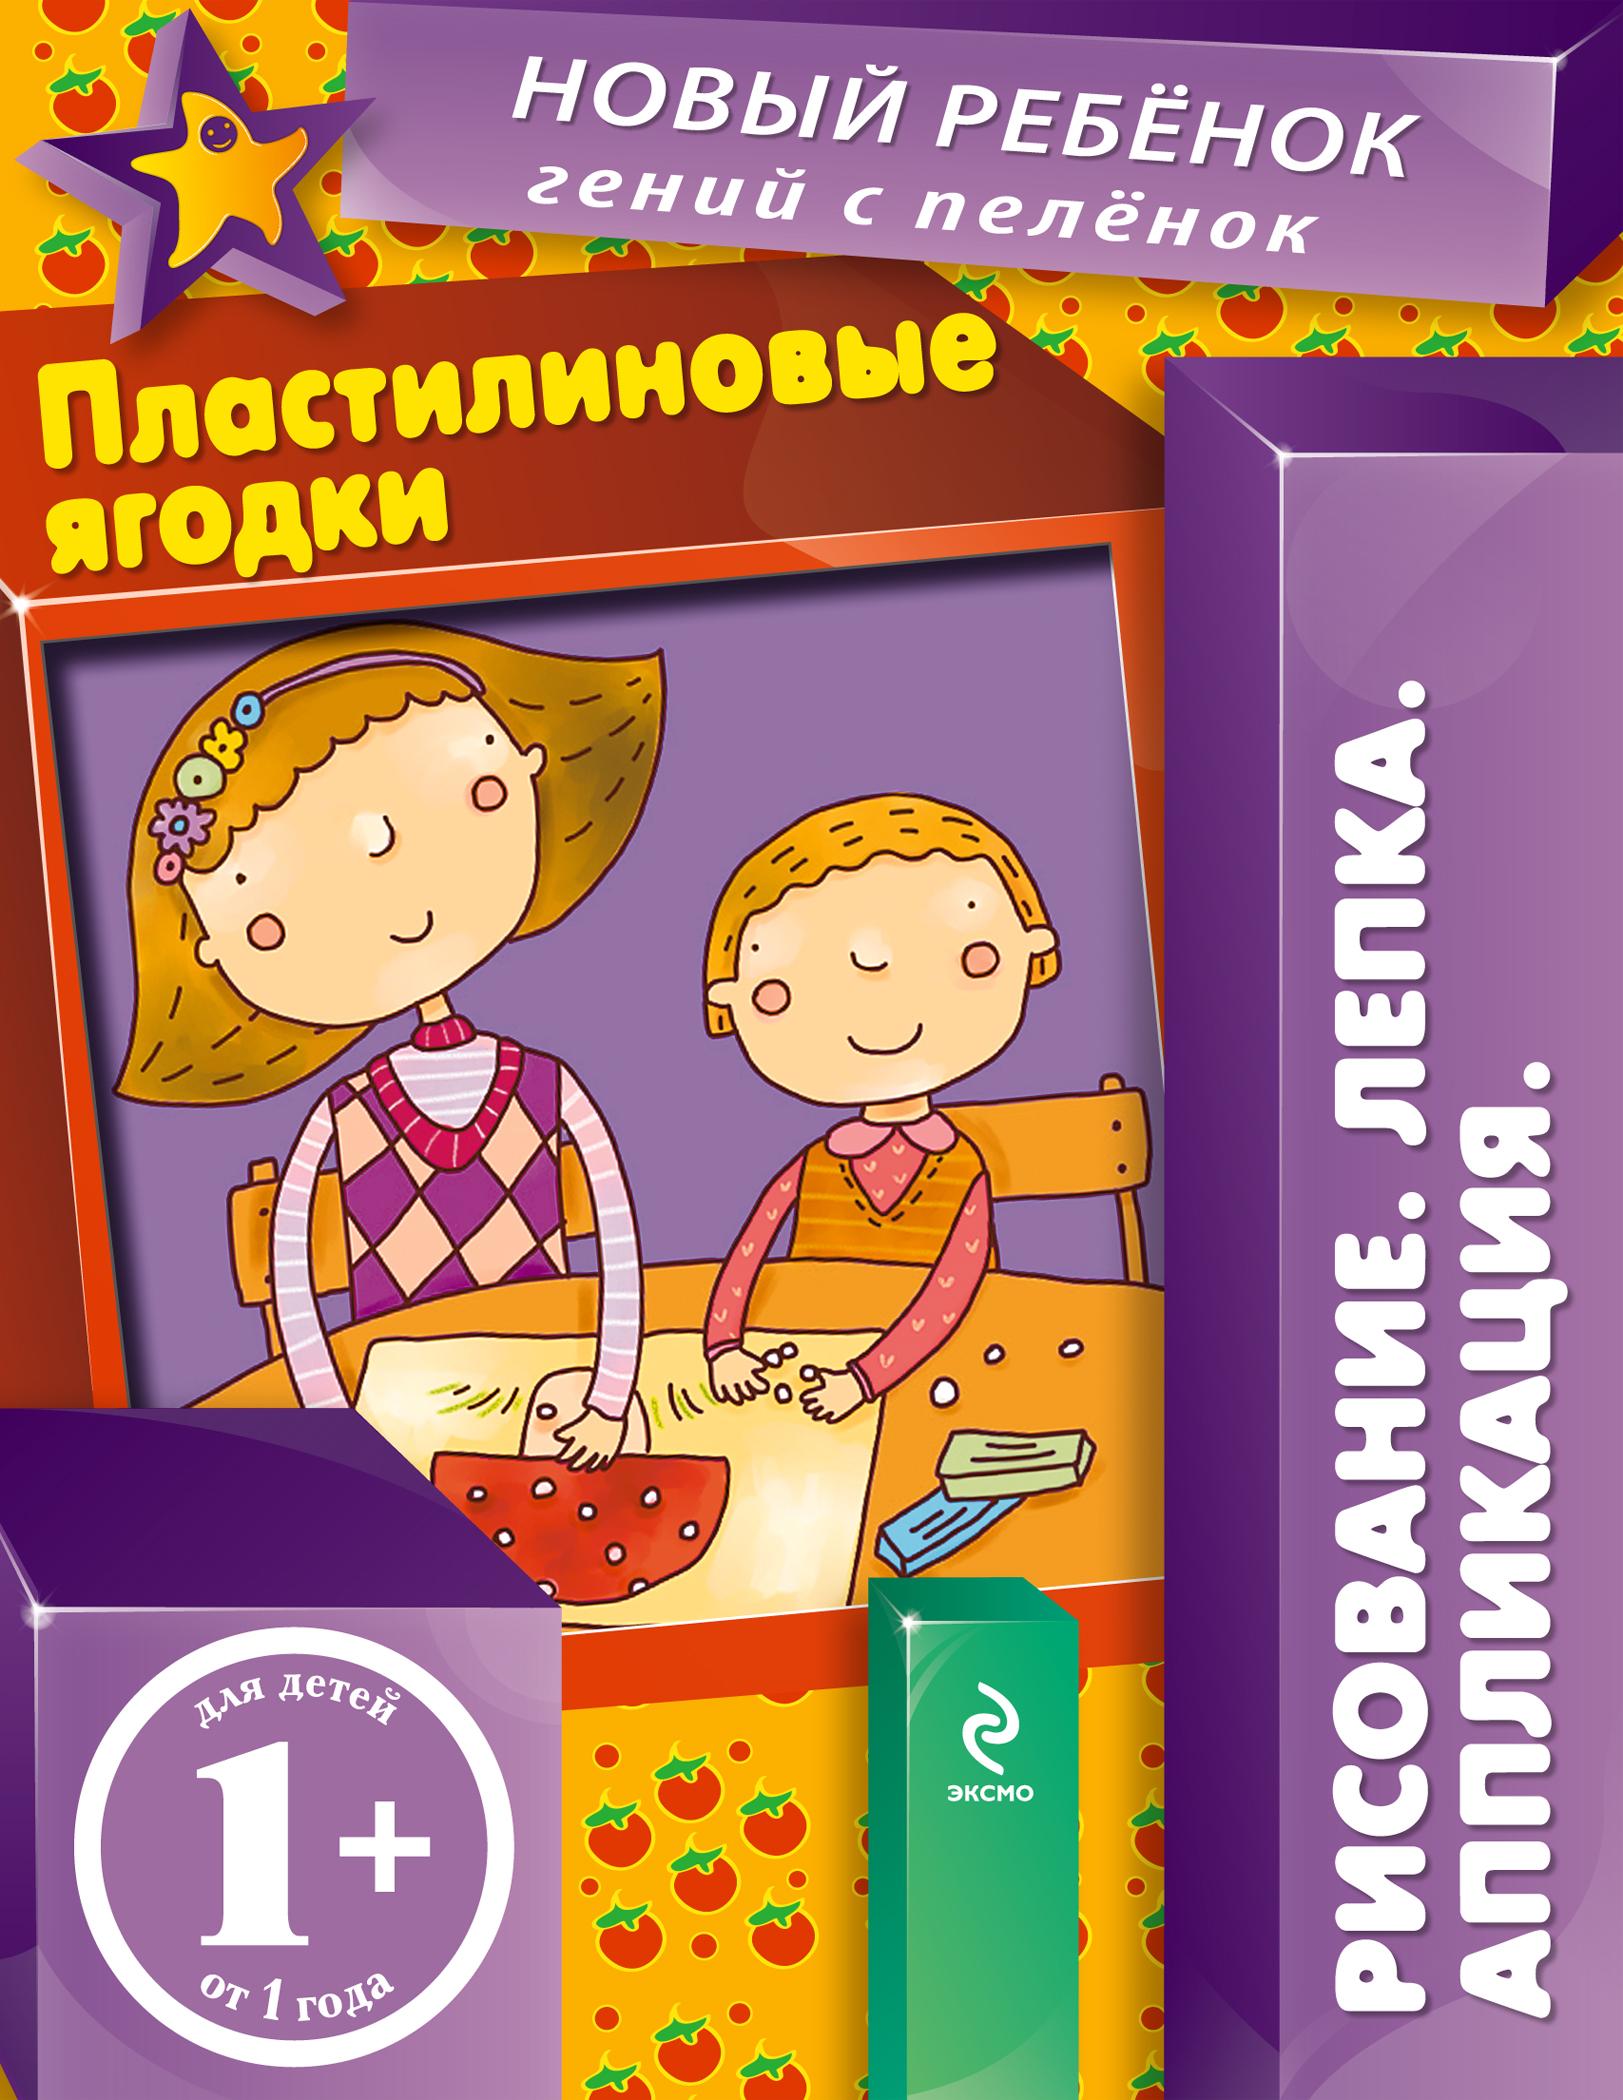 1+ Пластилиновые ягодки (многоразовая тетрадь) ( Янушко Е.А.  )